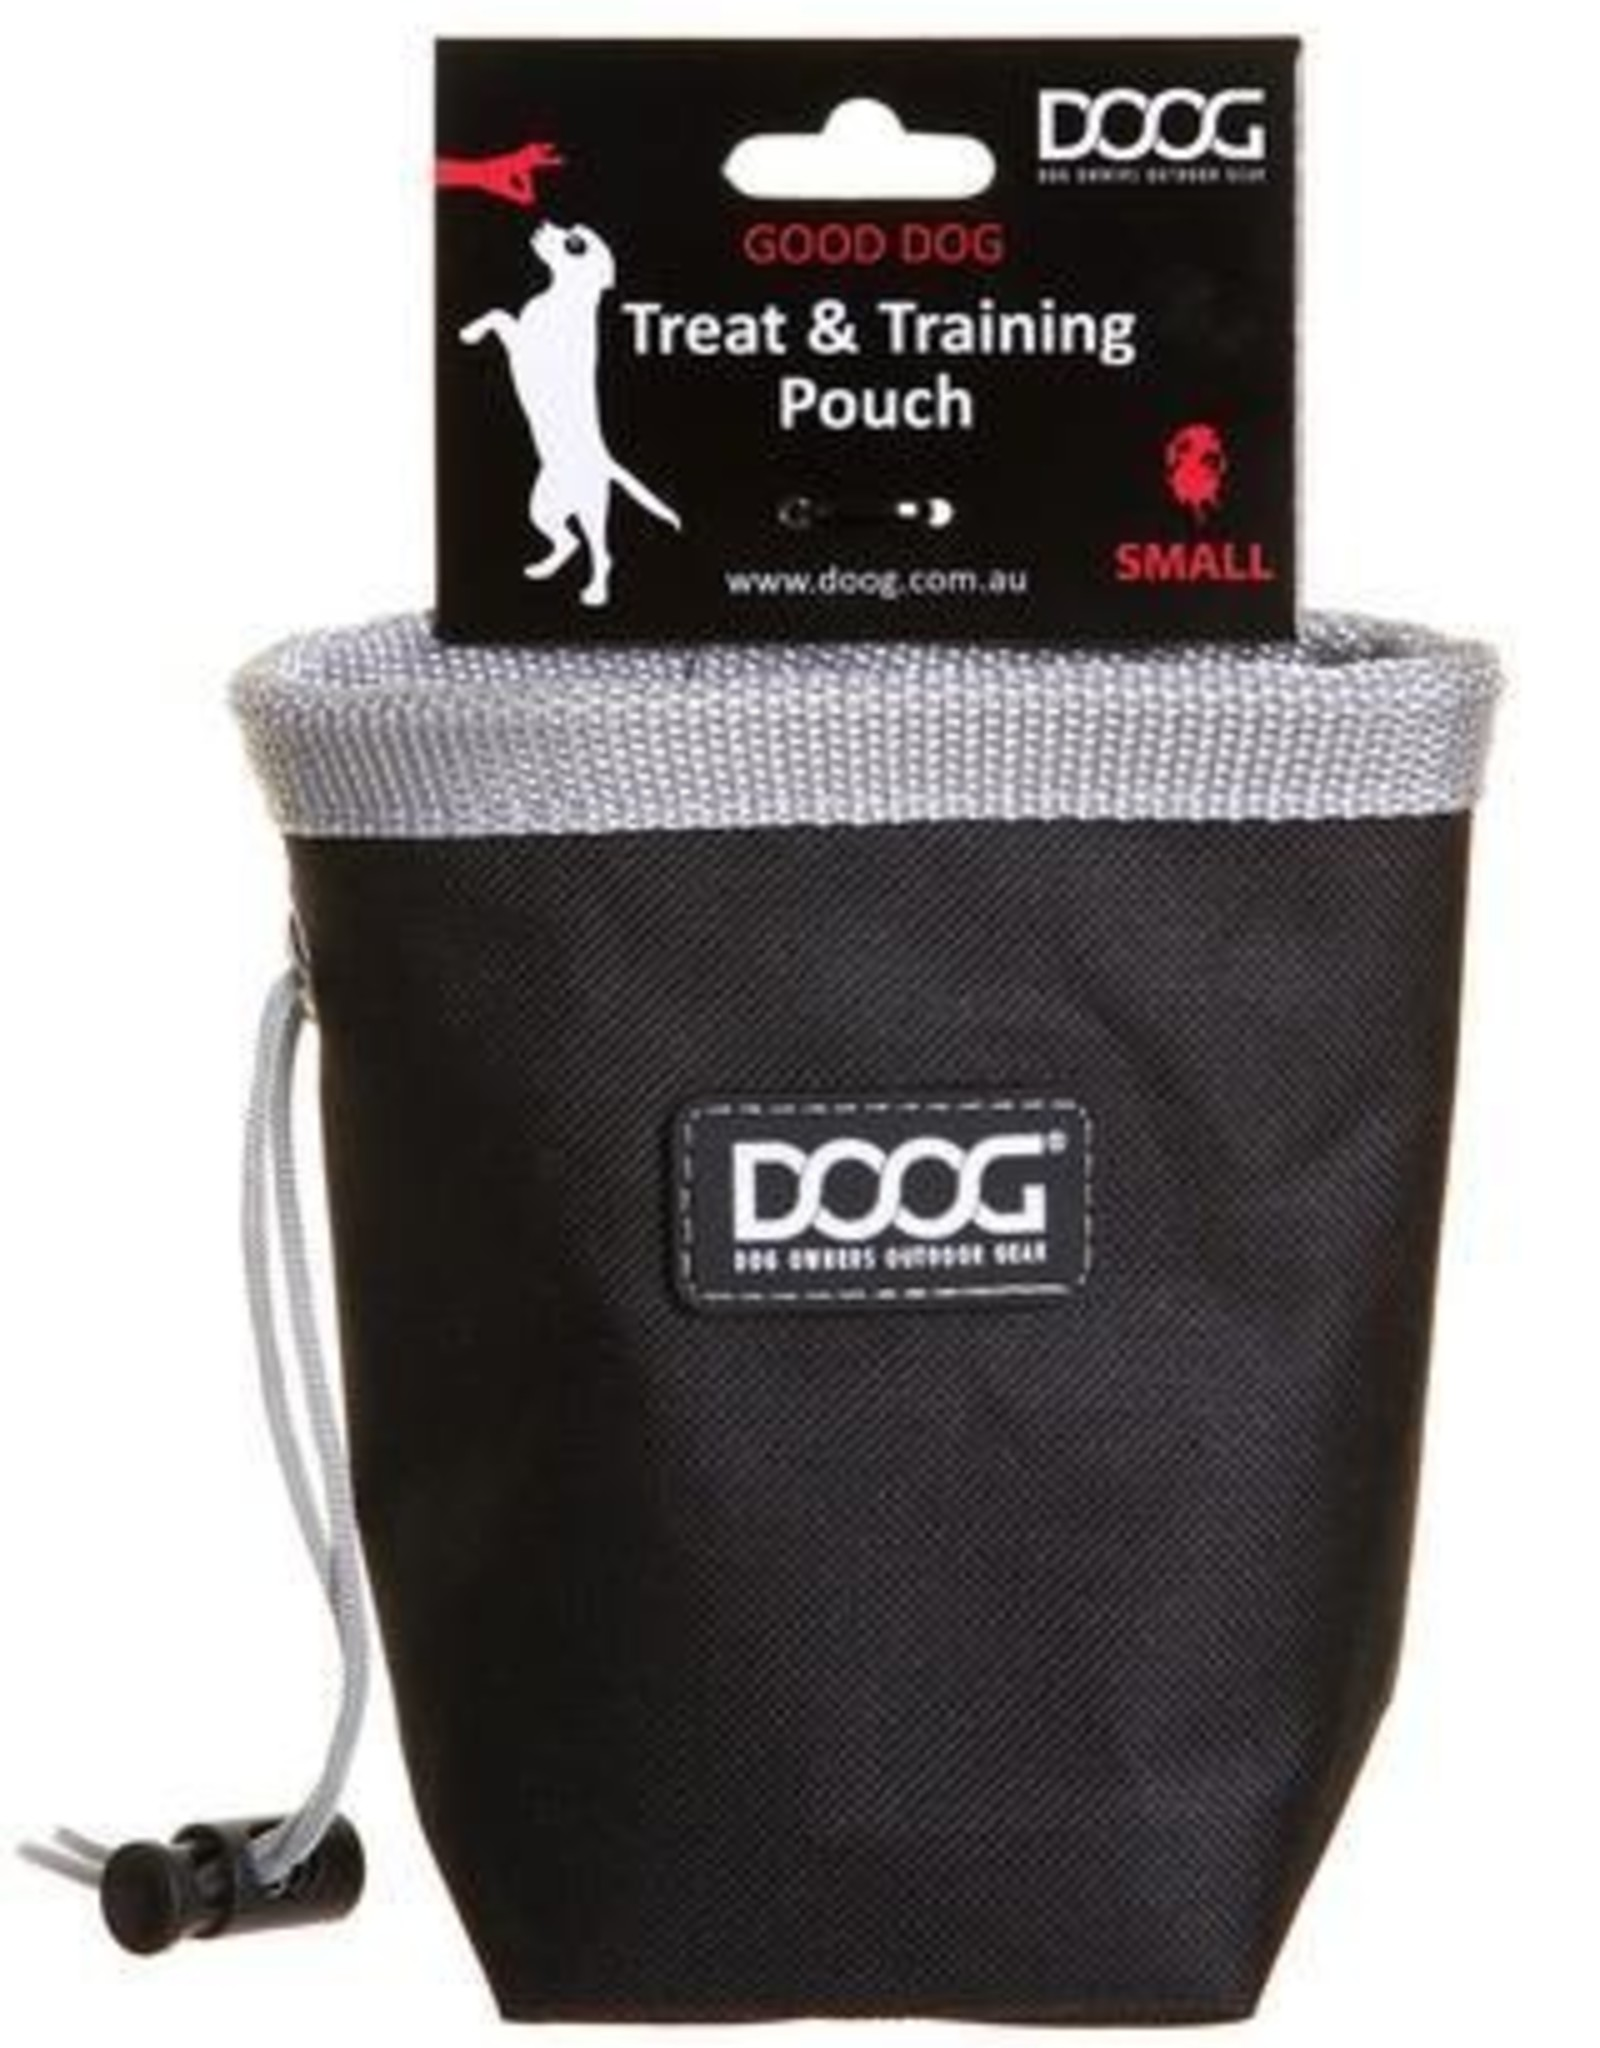 DOOG Doog | Good Dog Treat Pouch - Small